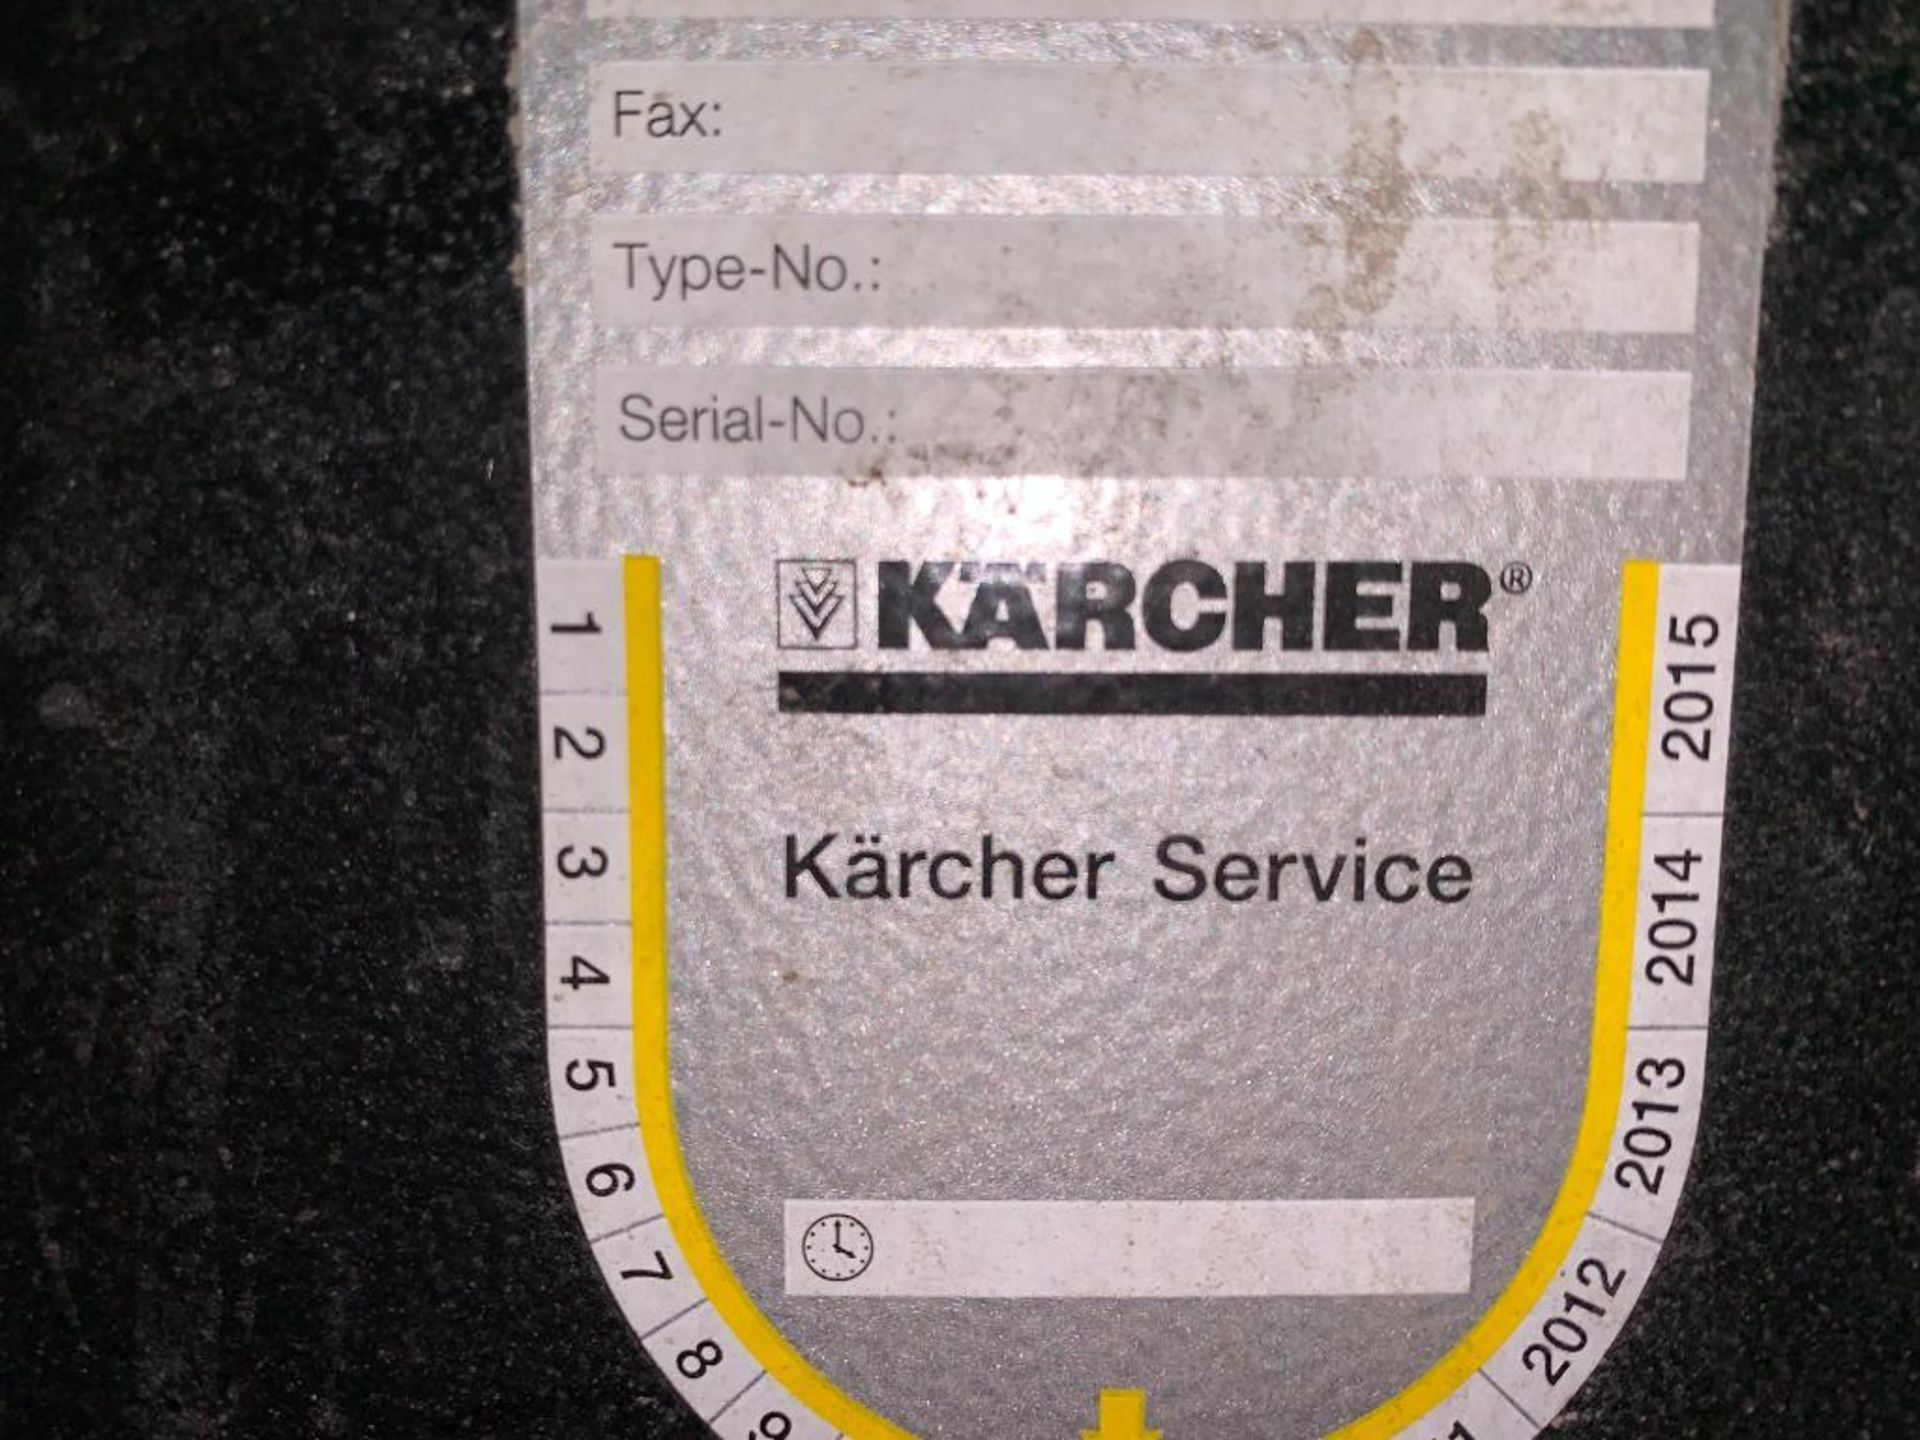 2012 Karcher walk behind floor scrubber - Image 3 of 12